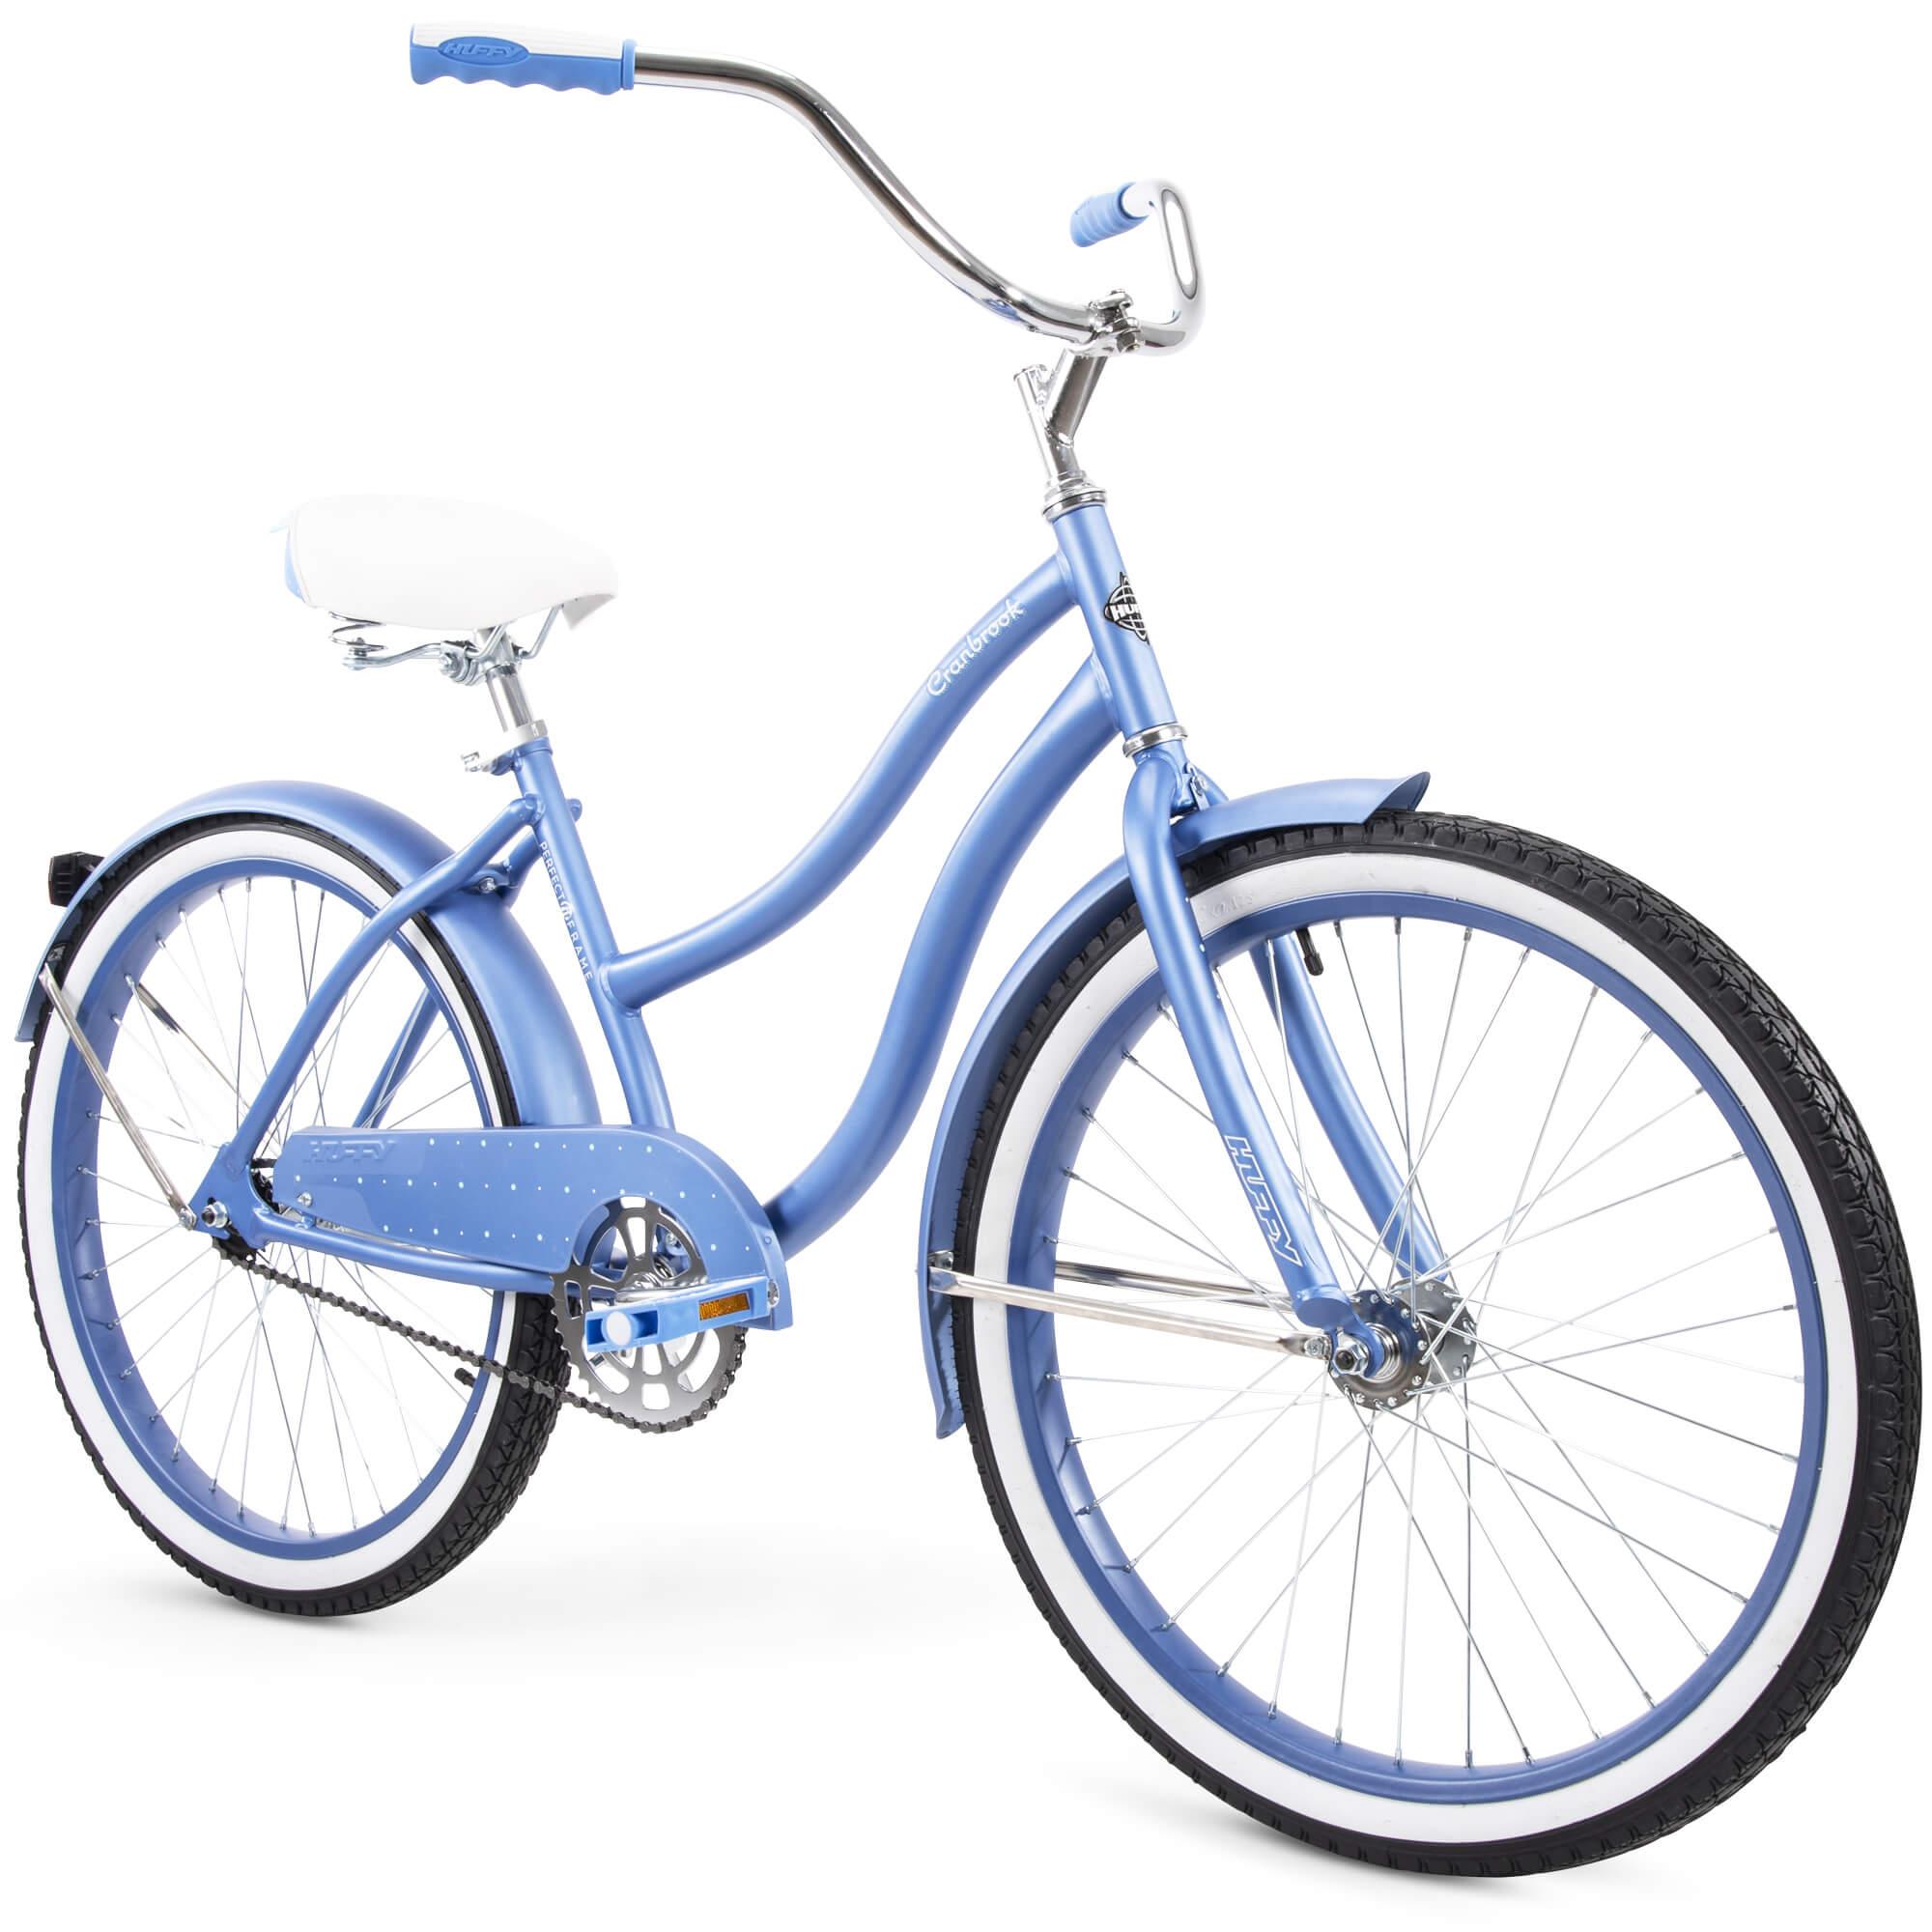 "Huffy 24"" Cranbrook Women's Comfort Cruiser Bike"